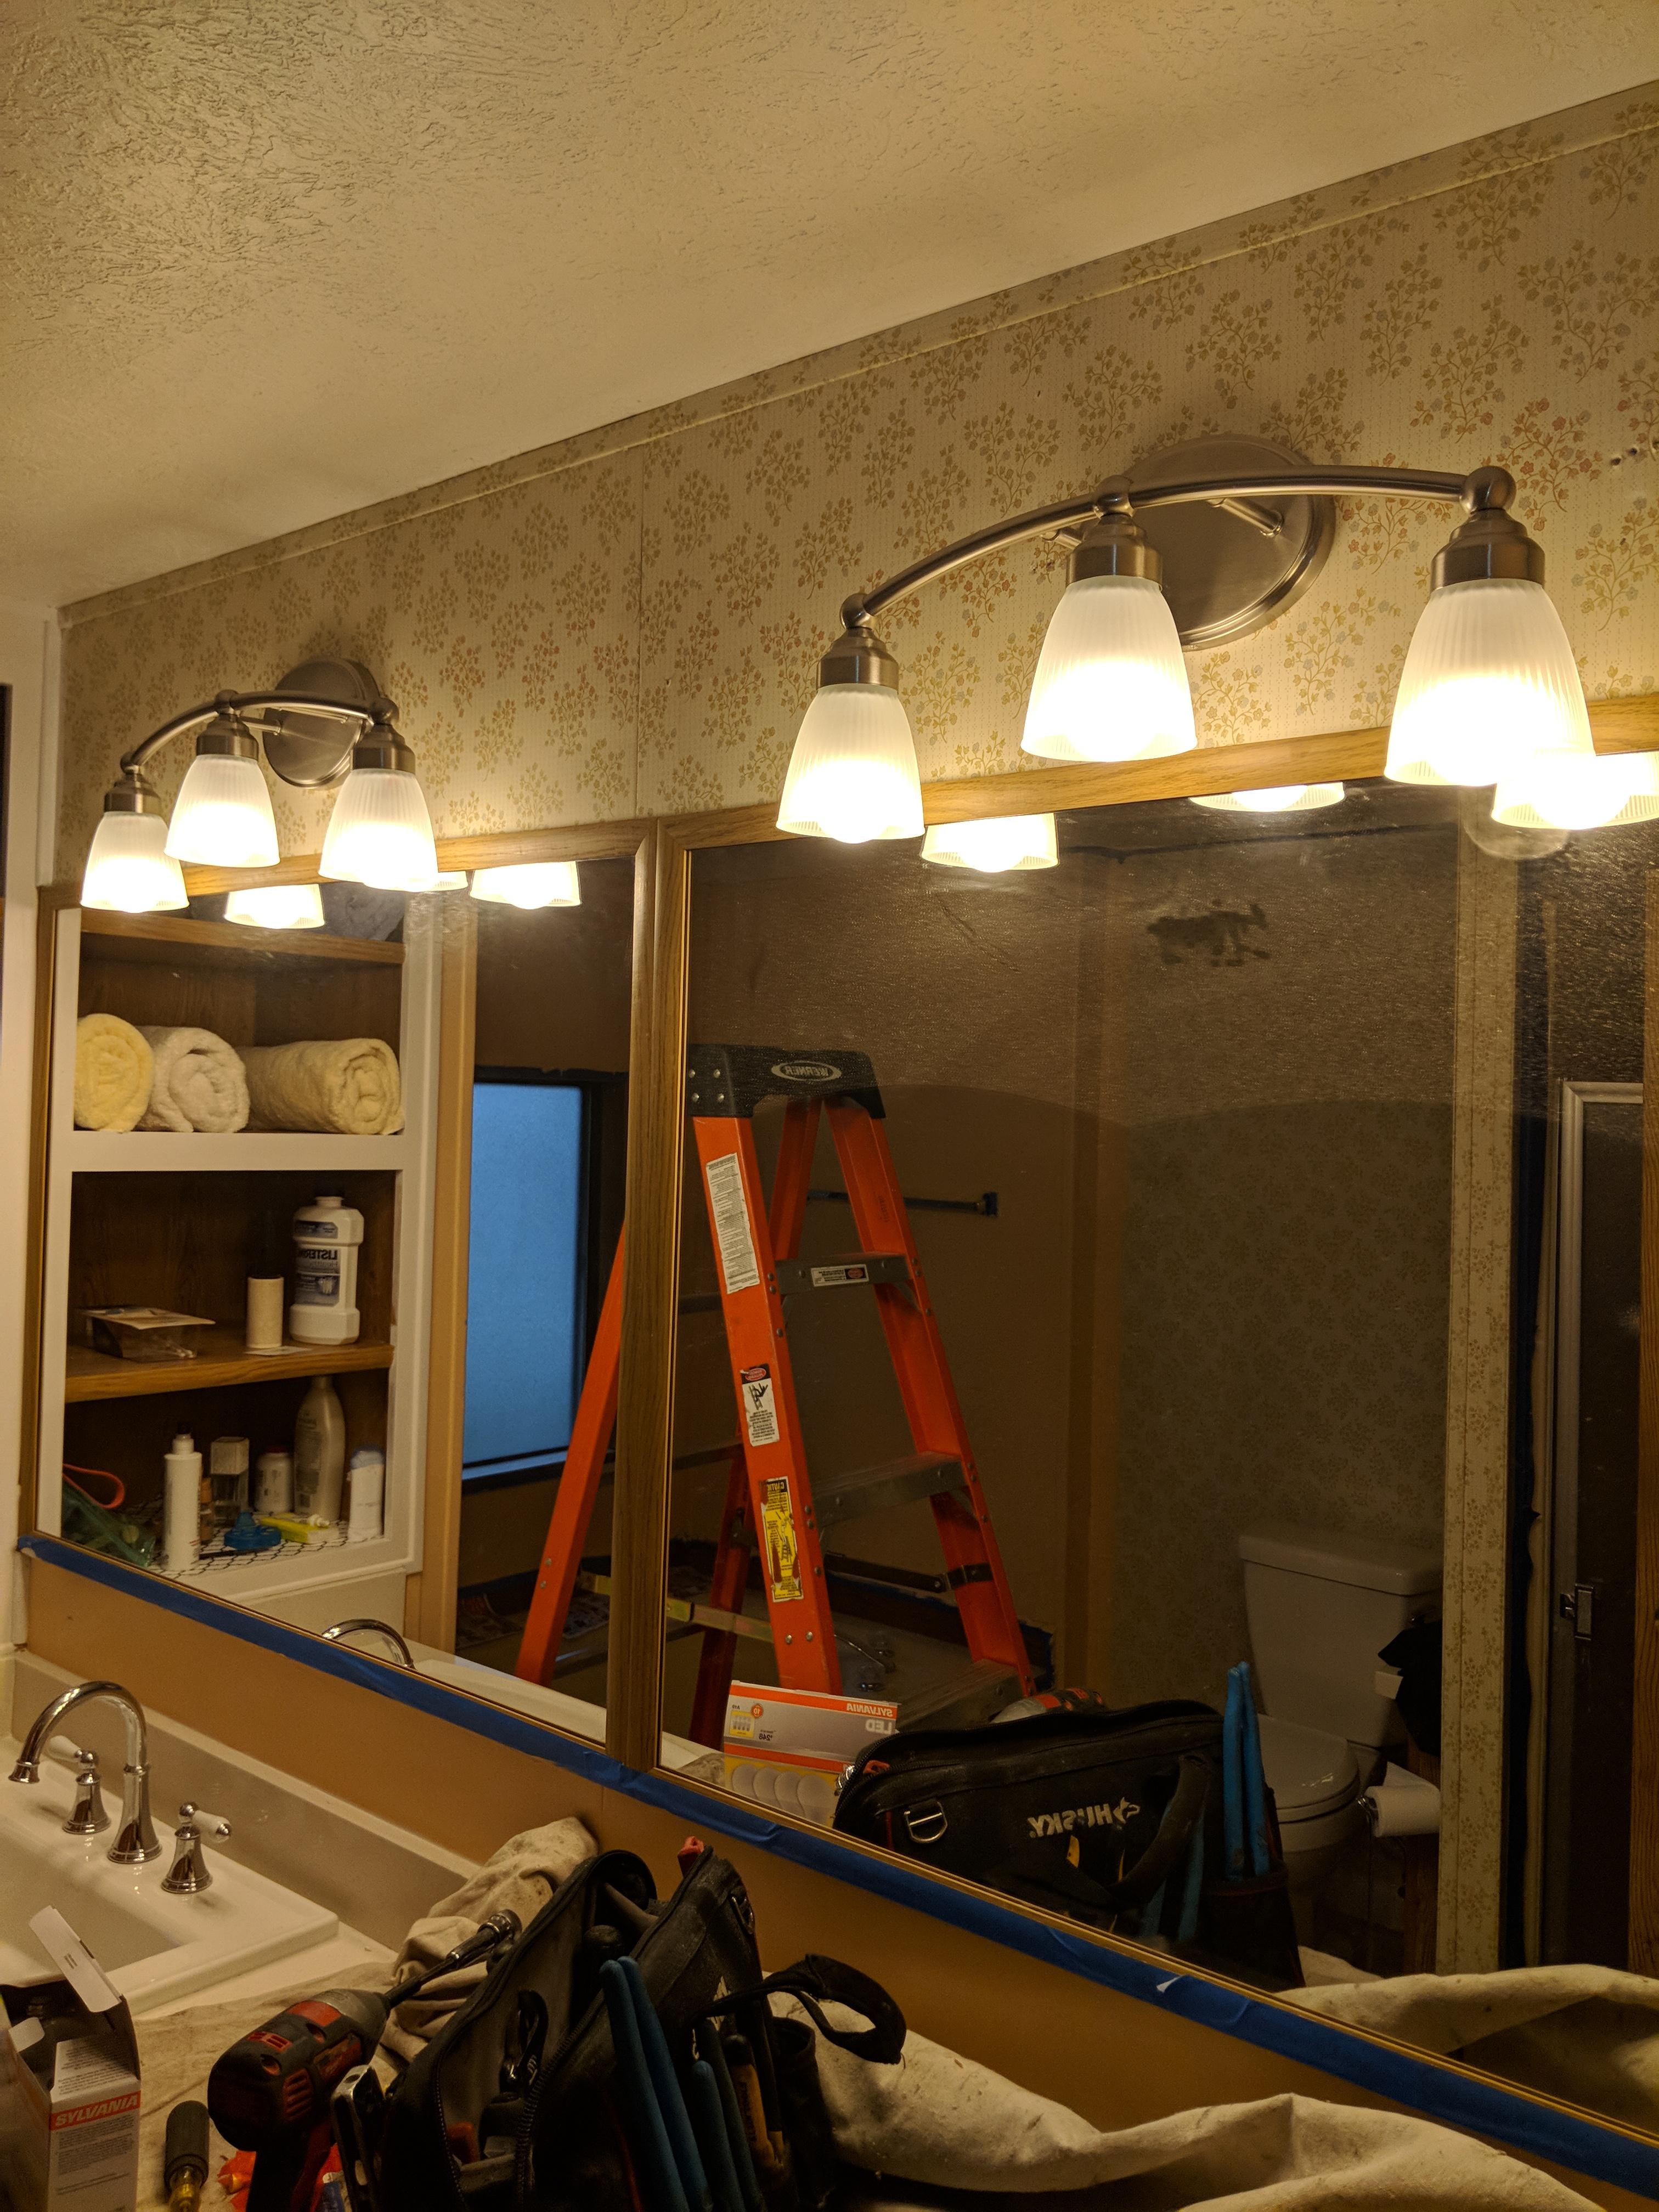 Bathroom lighting project